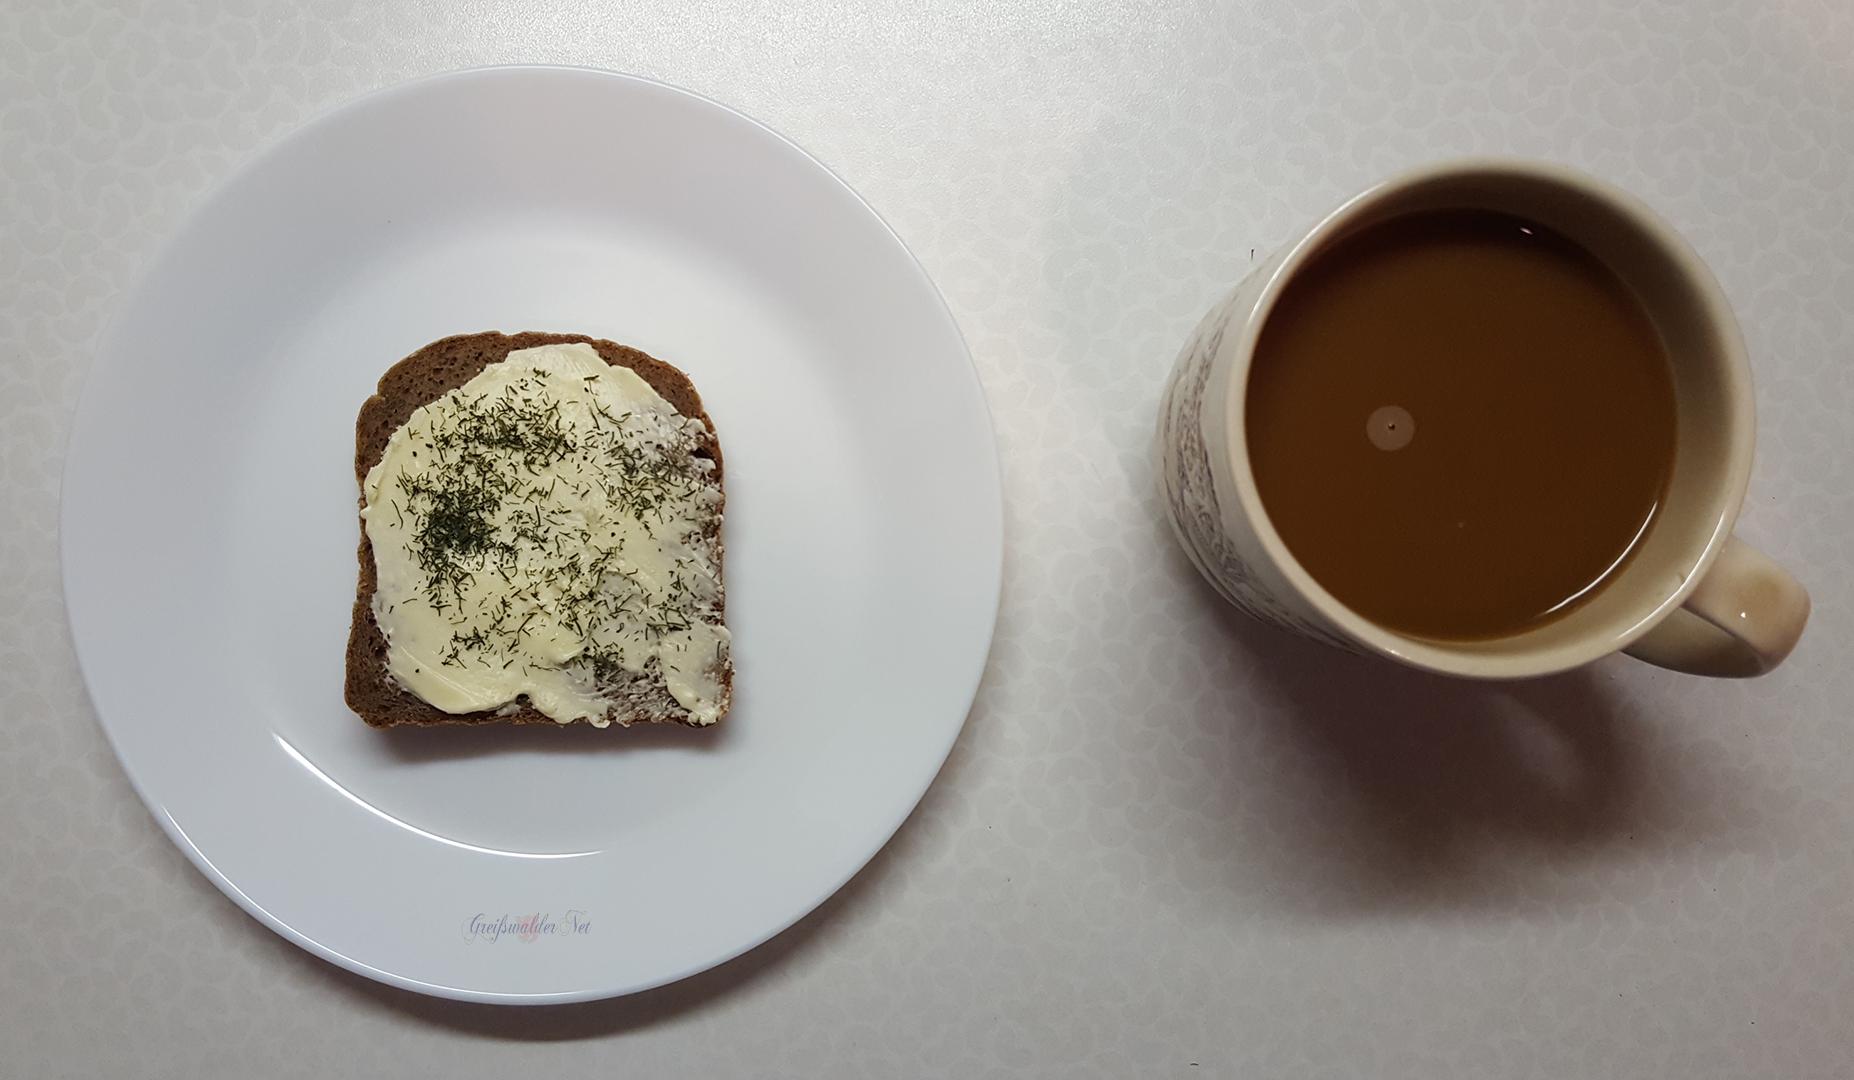 Roggenbrot mit Dill, dazu ein Kaffee